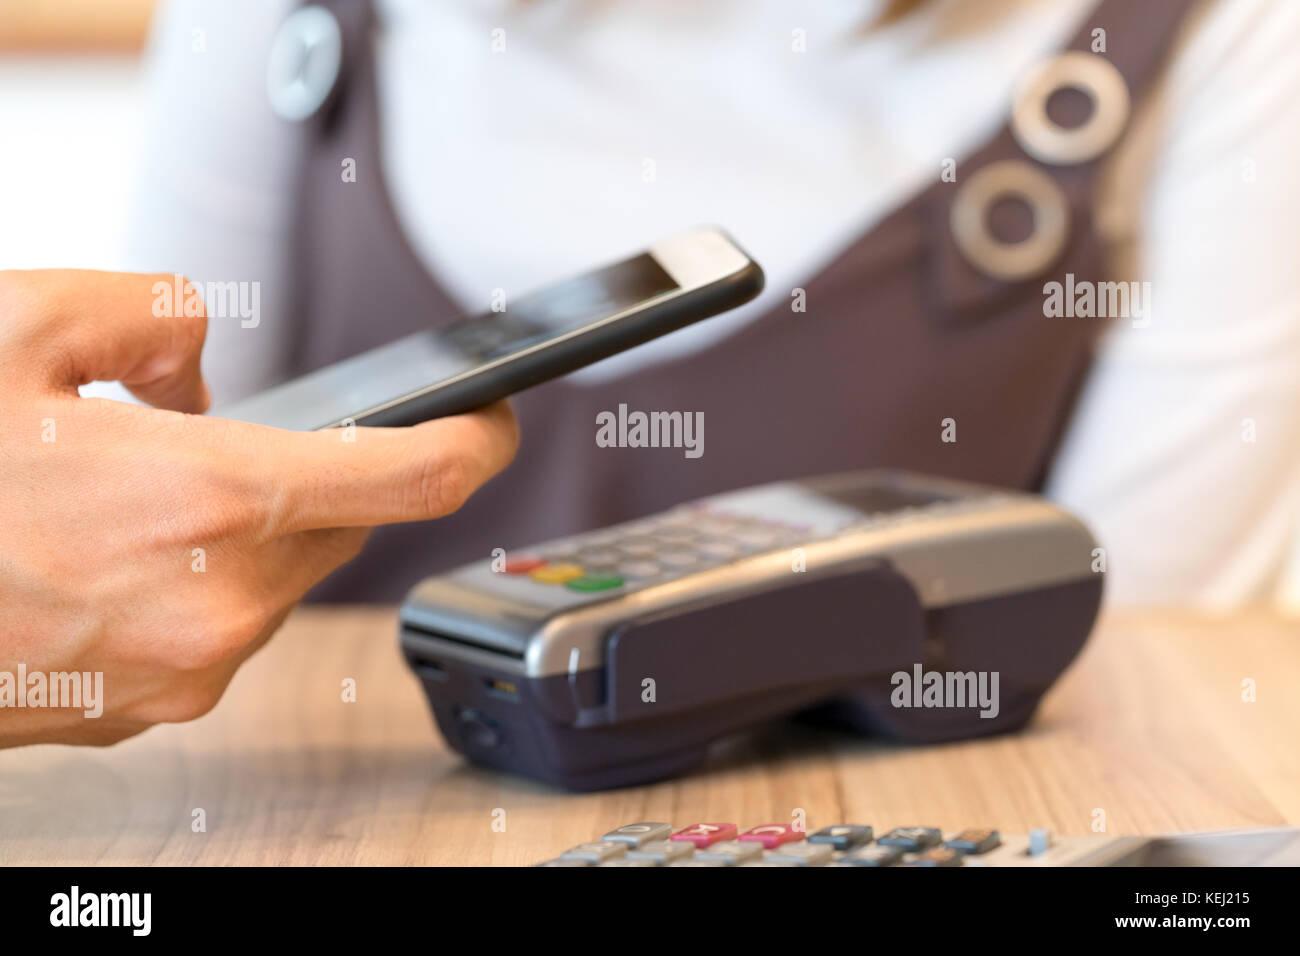 Mann Geld via Smartphone mit Magnetkarte Konzept - Finanzielle Technologie Stockbild